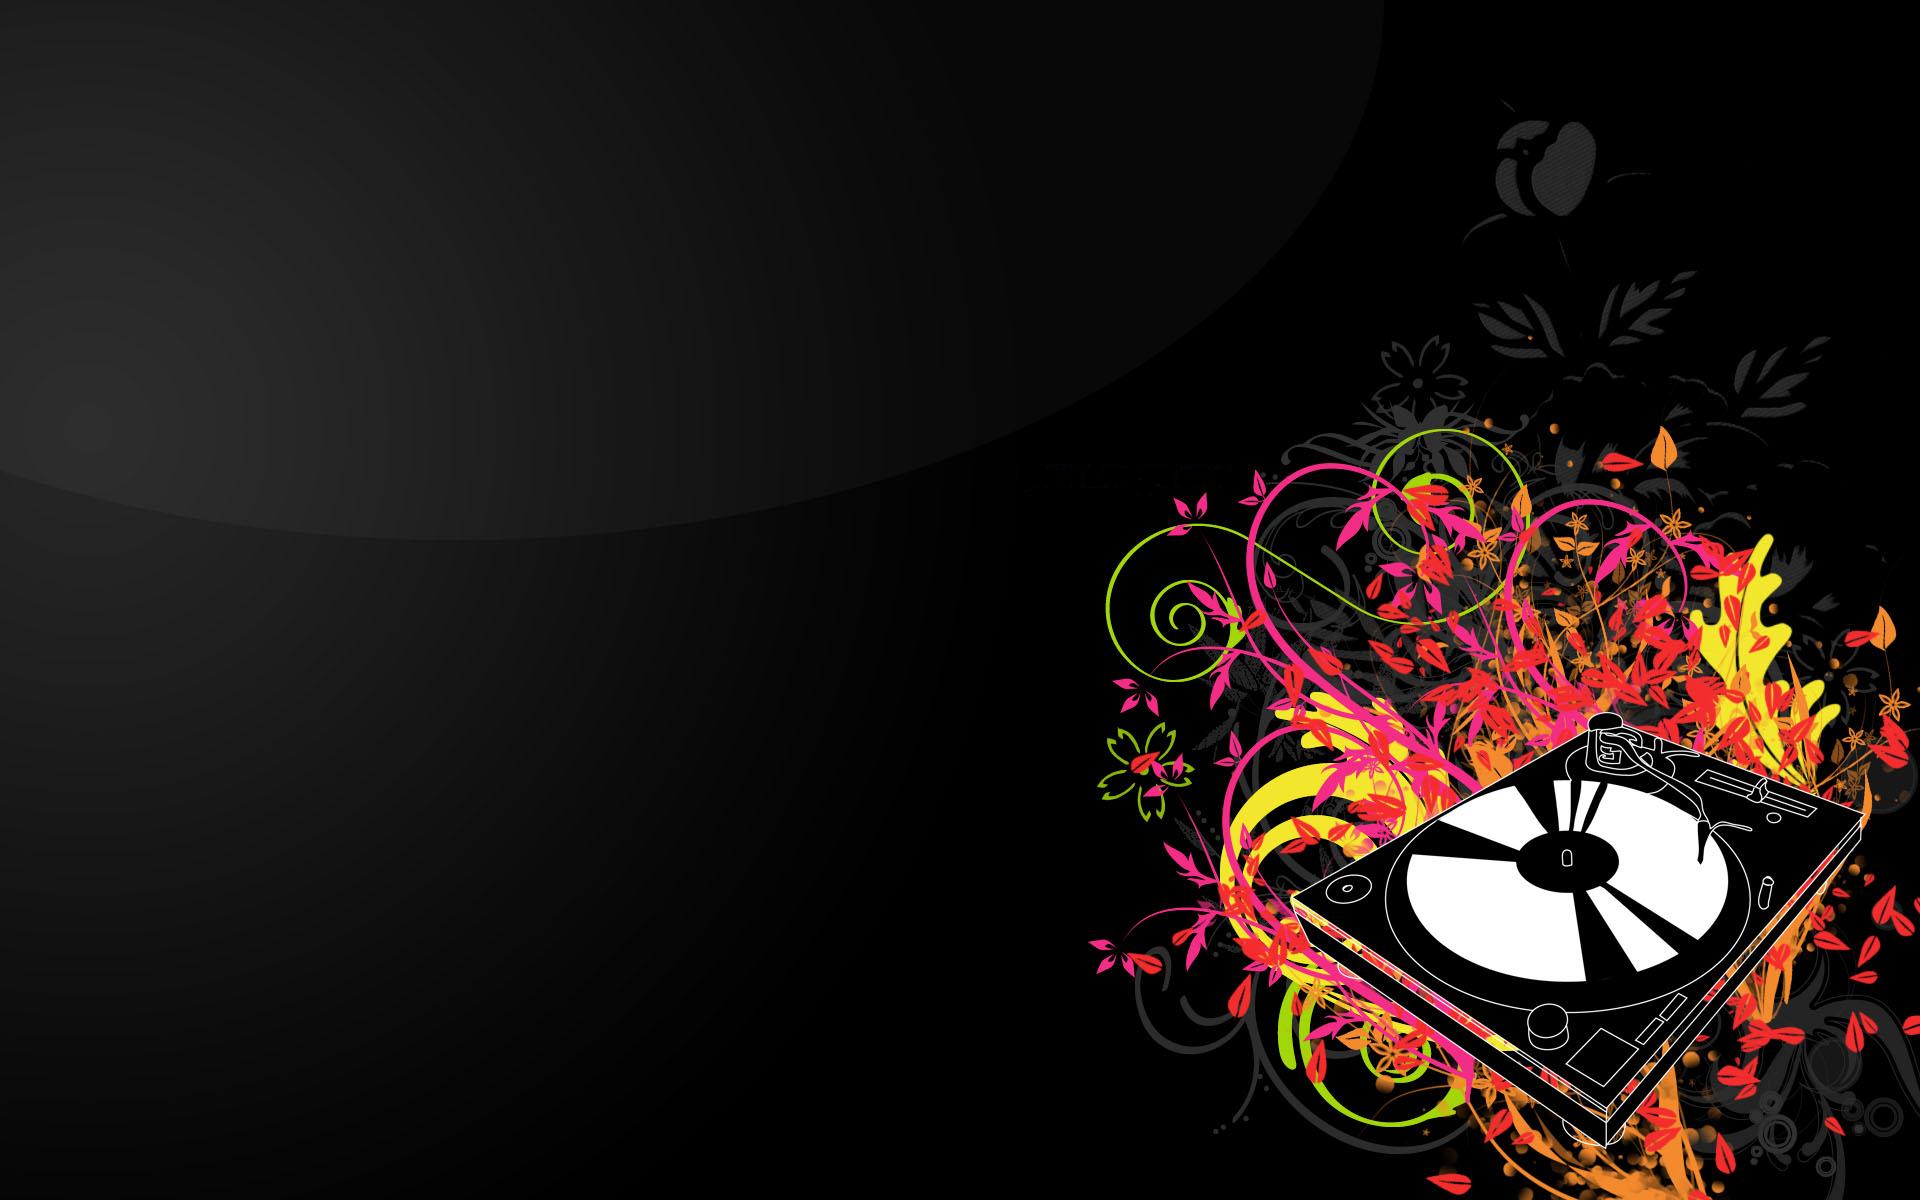 DJ Abstract Wallpapers DJ Abstract HD Wallpapers DJ 1920x1200